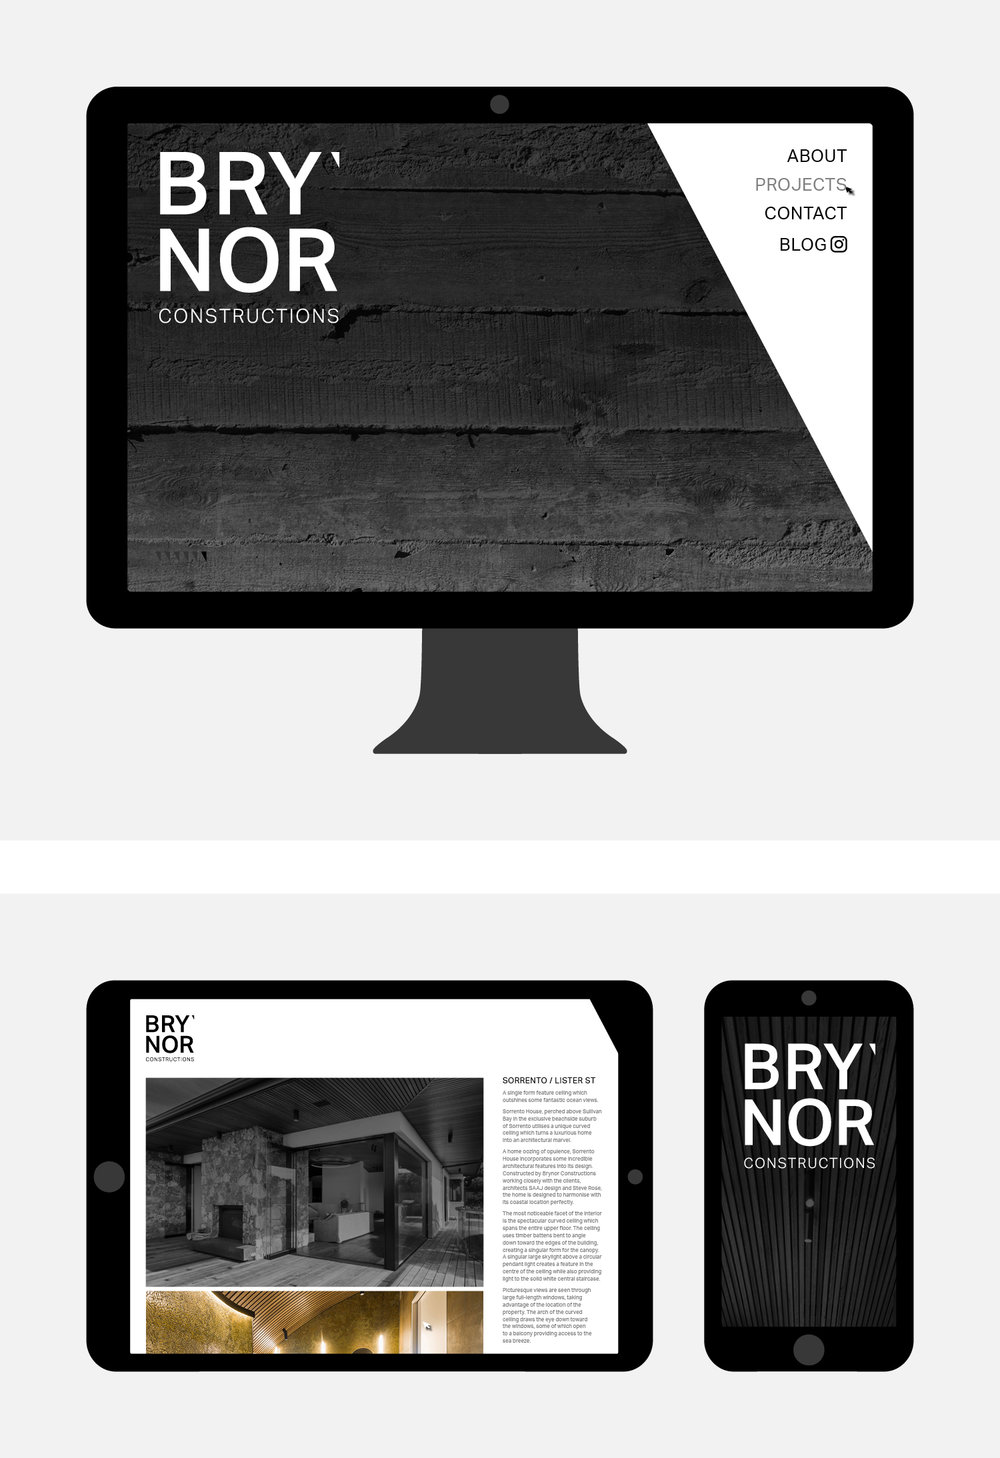 Gray+Design+Brynor+Constructions+website-4.jpg